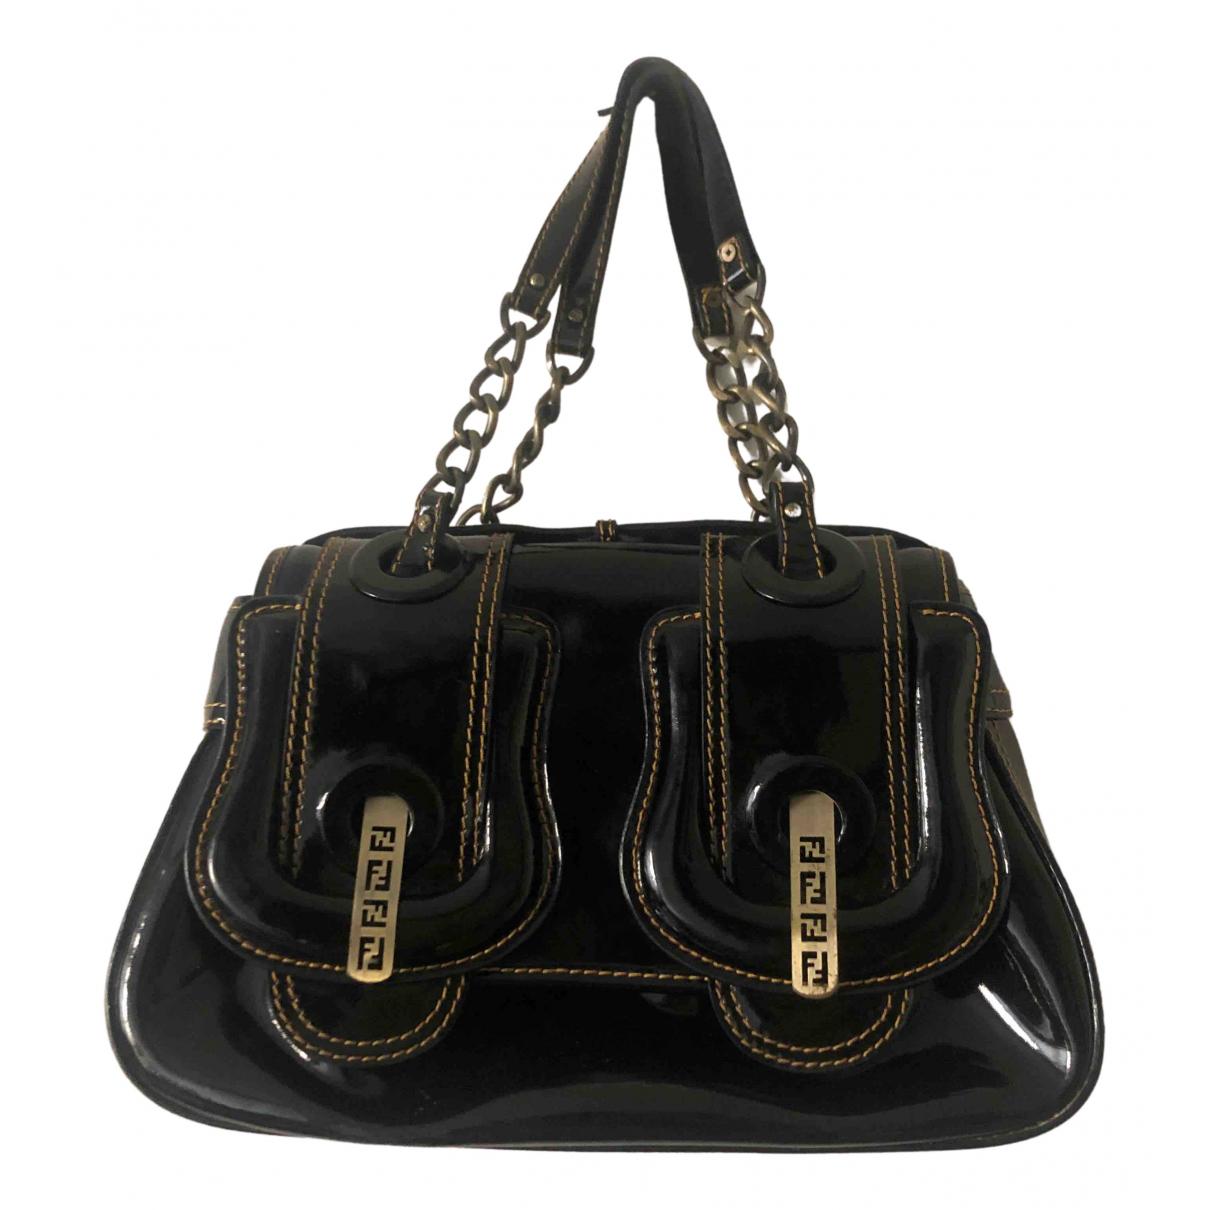 Fendi B Bag Black Patent leather handbag for Women \N